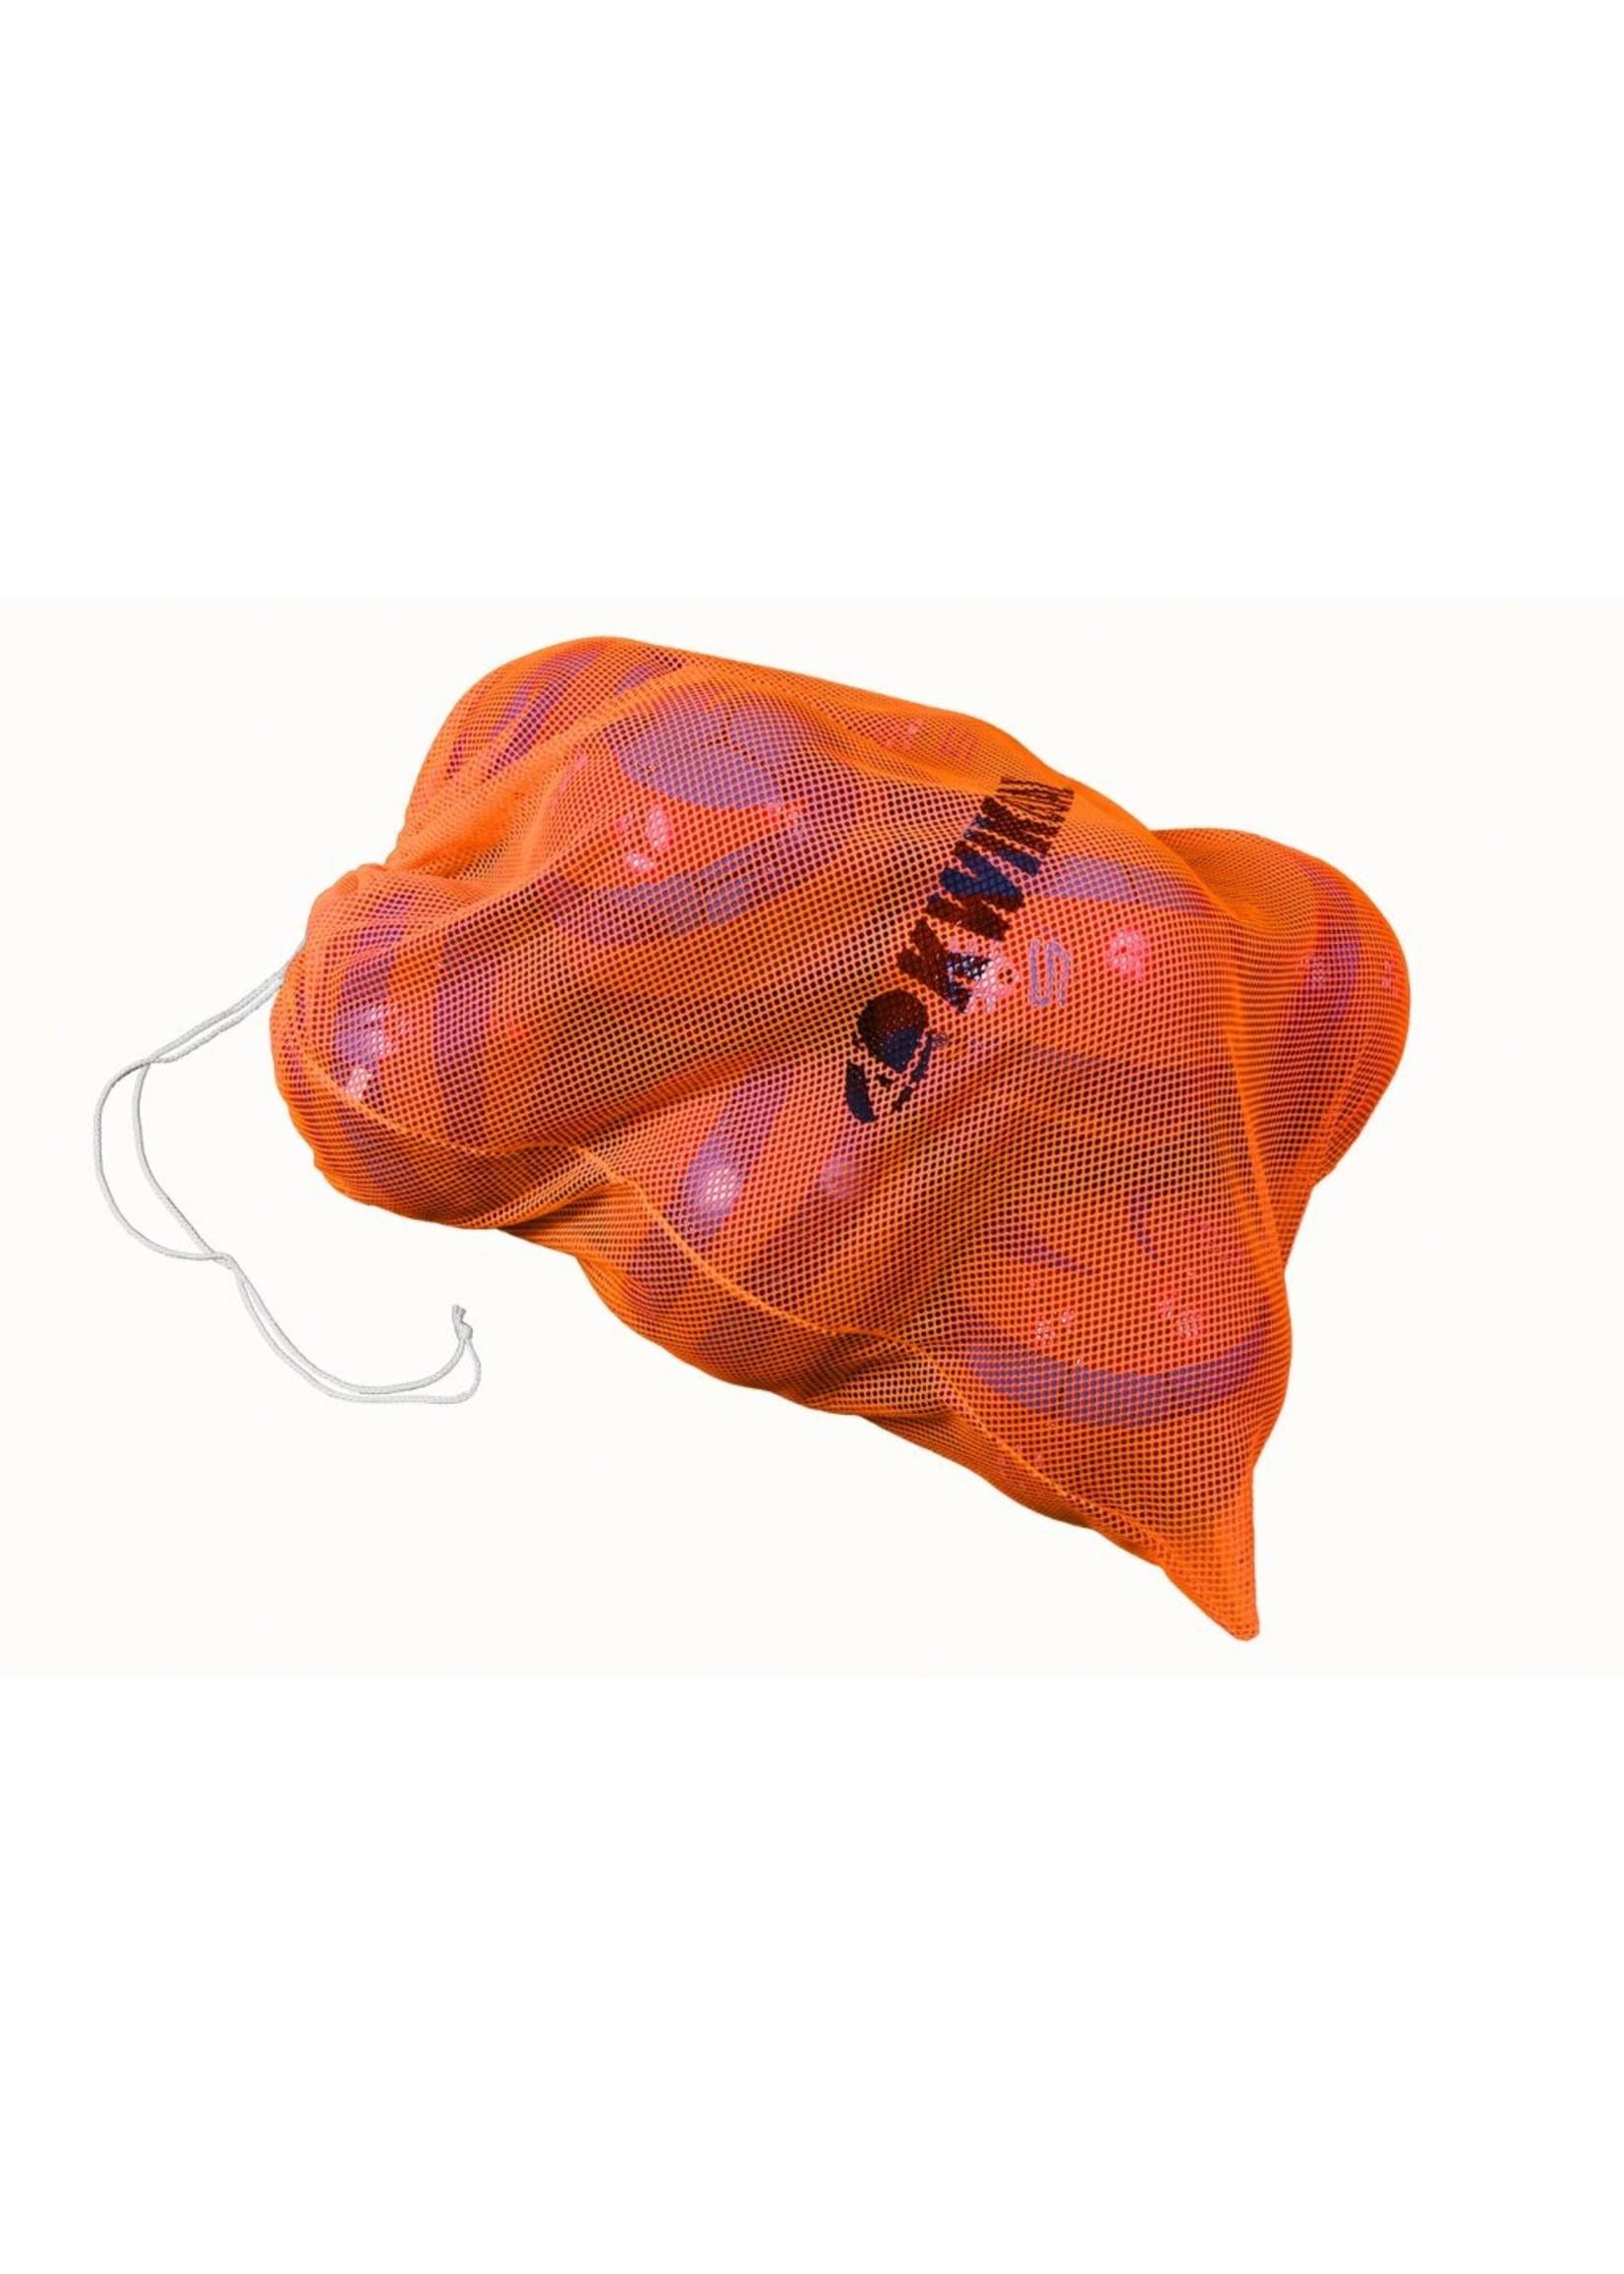 "Kwik Goal Equipment Ball Bag 24"" x 26"""